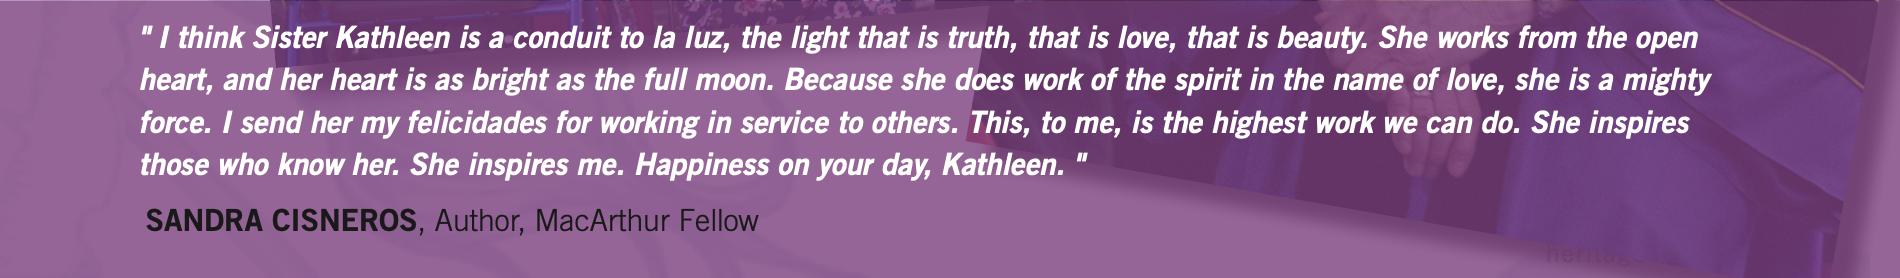 Sandra Cisneros quote for Kathleen Ross, snjm